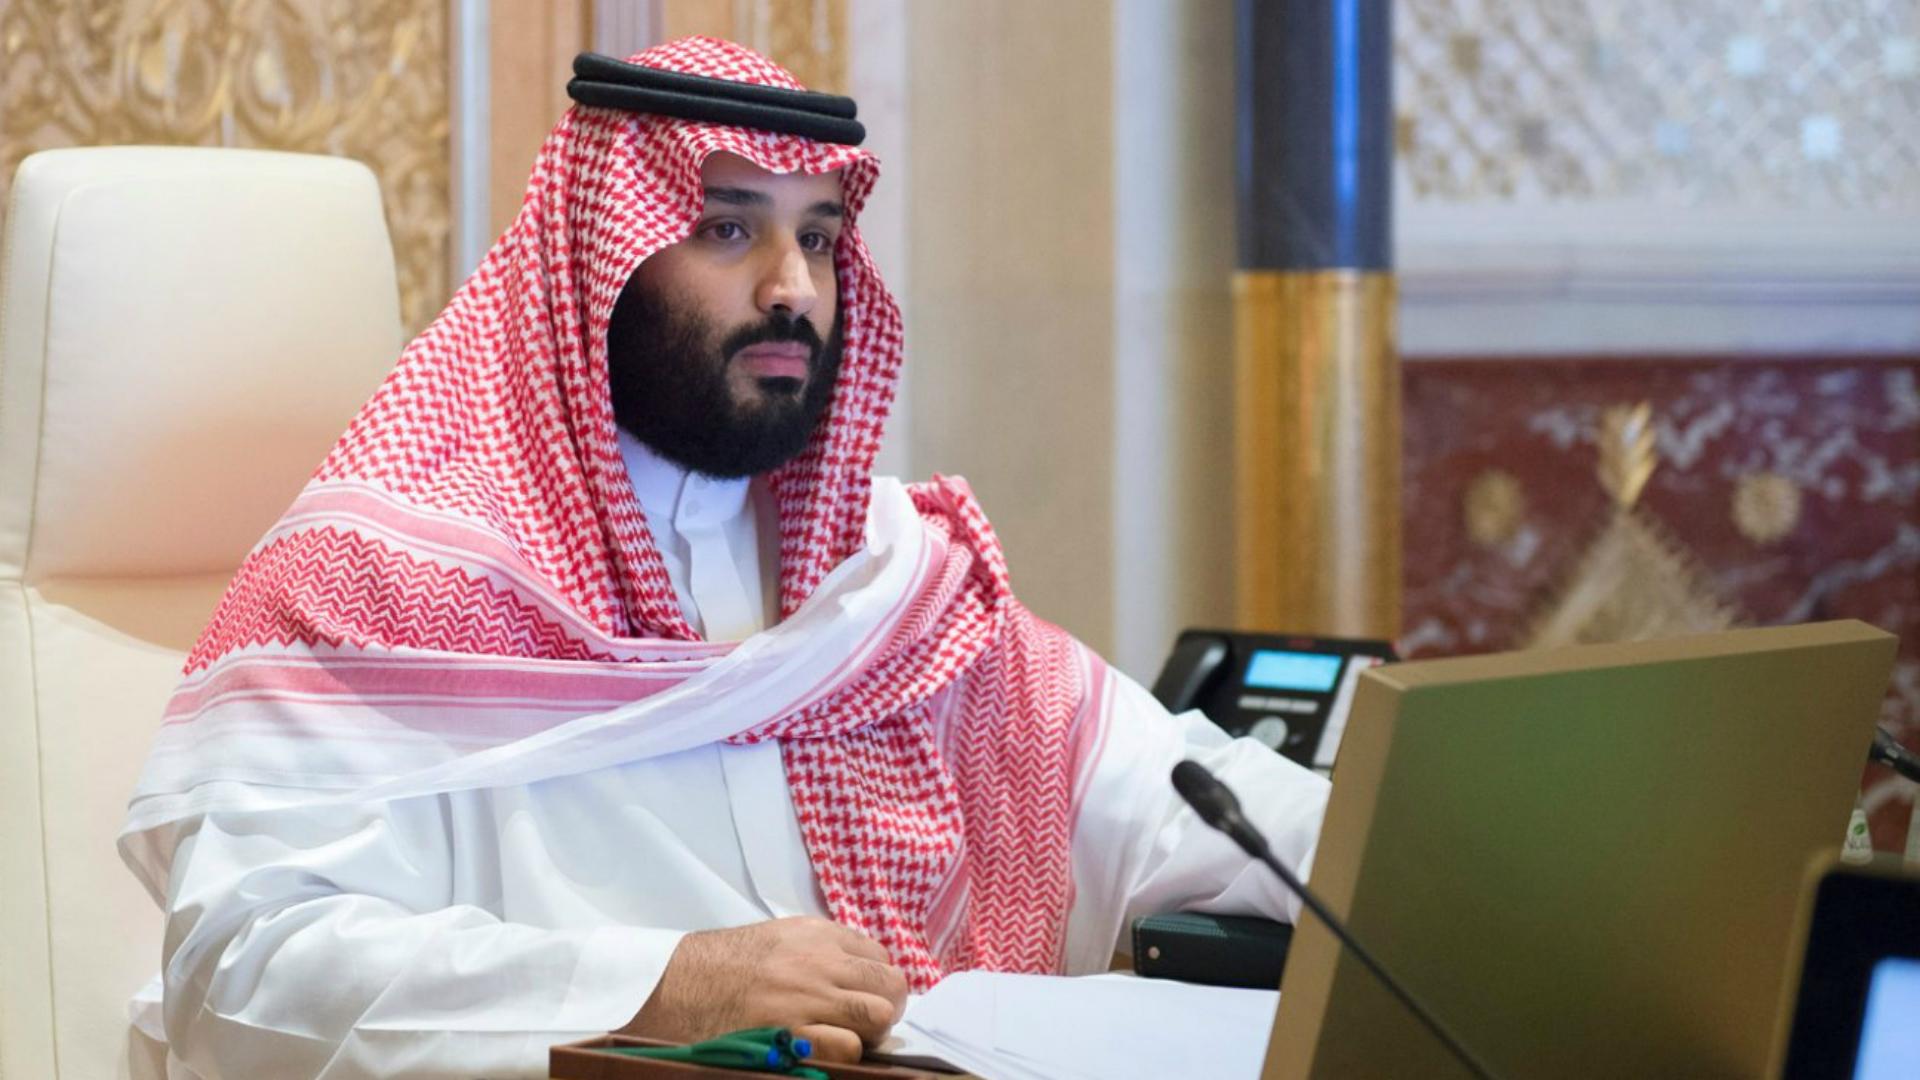 Mohammed bin Salman, el joven príncipe heredero de Arabia Saudita